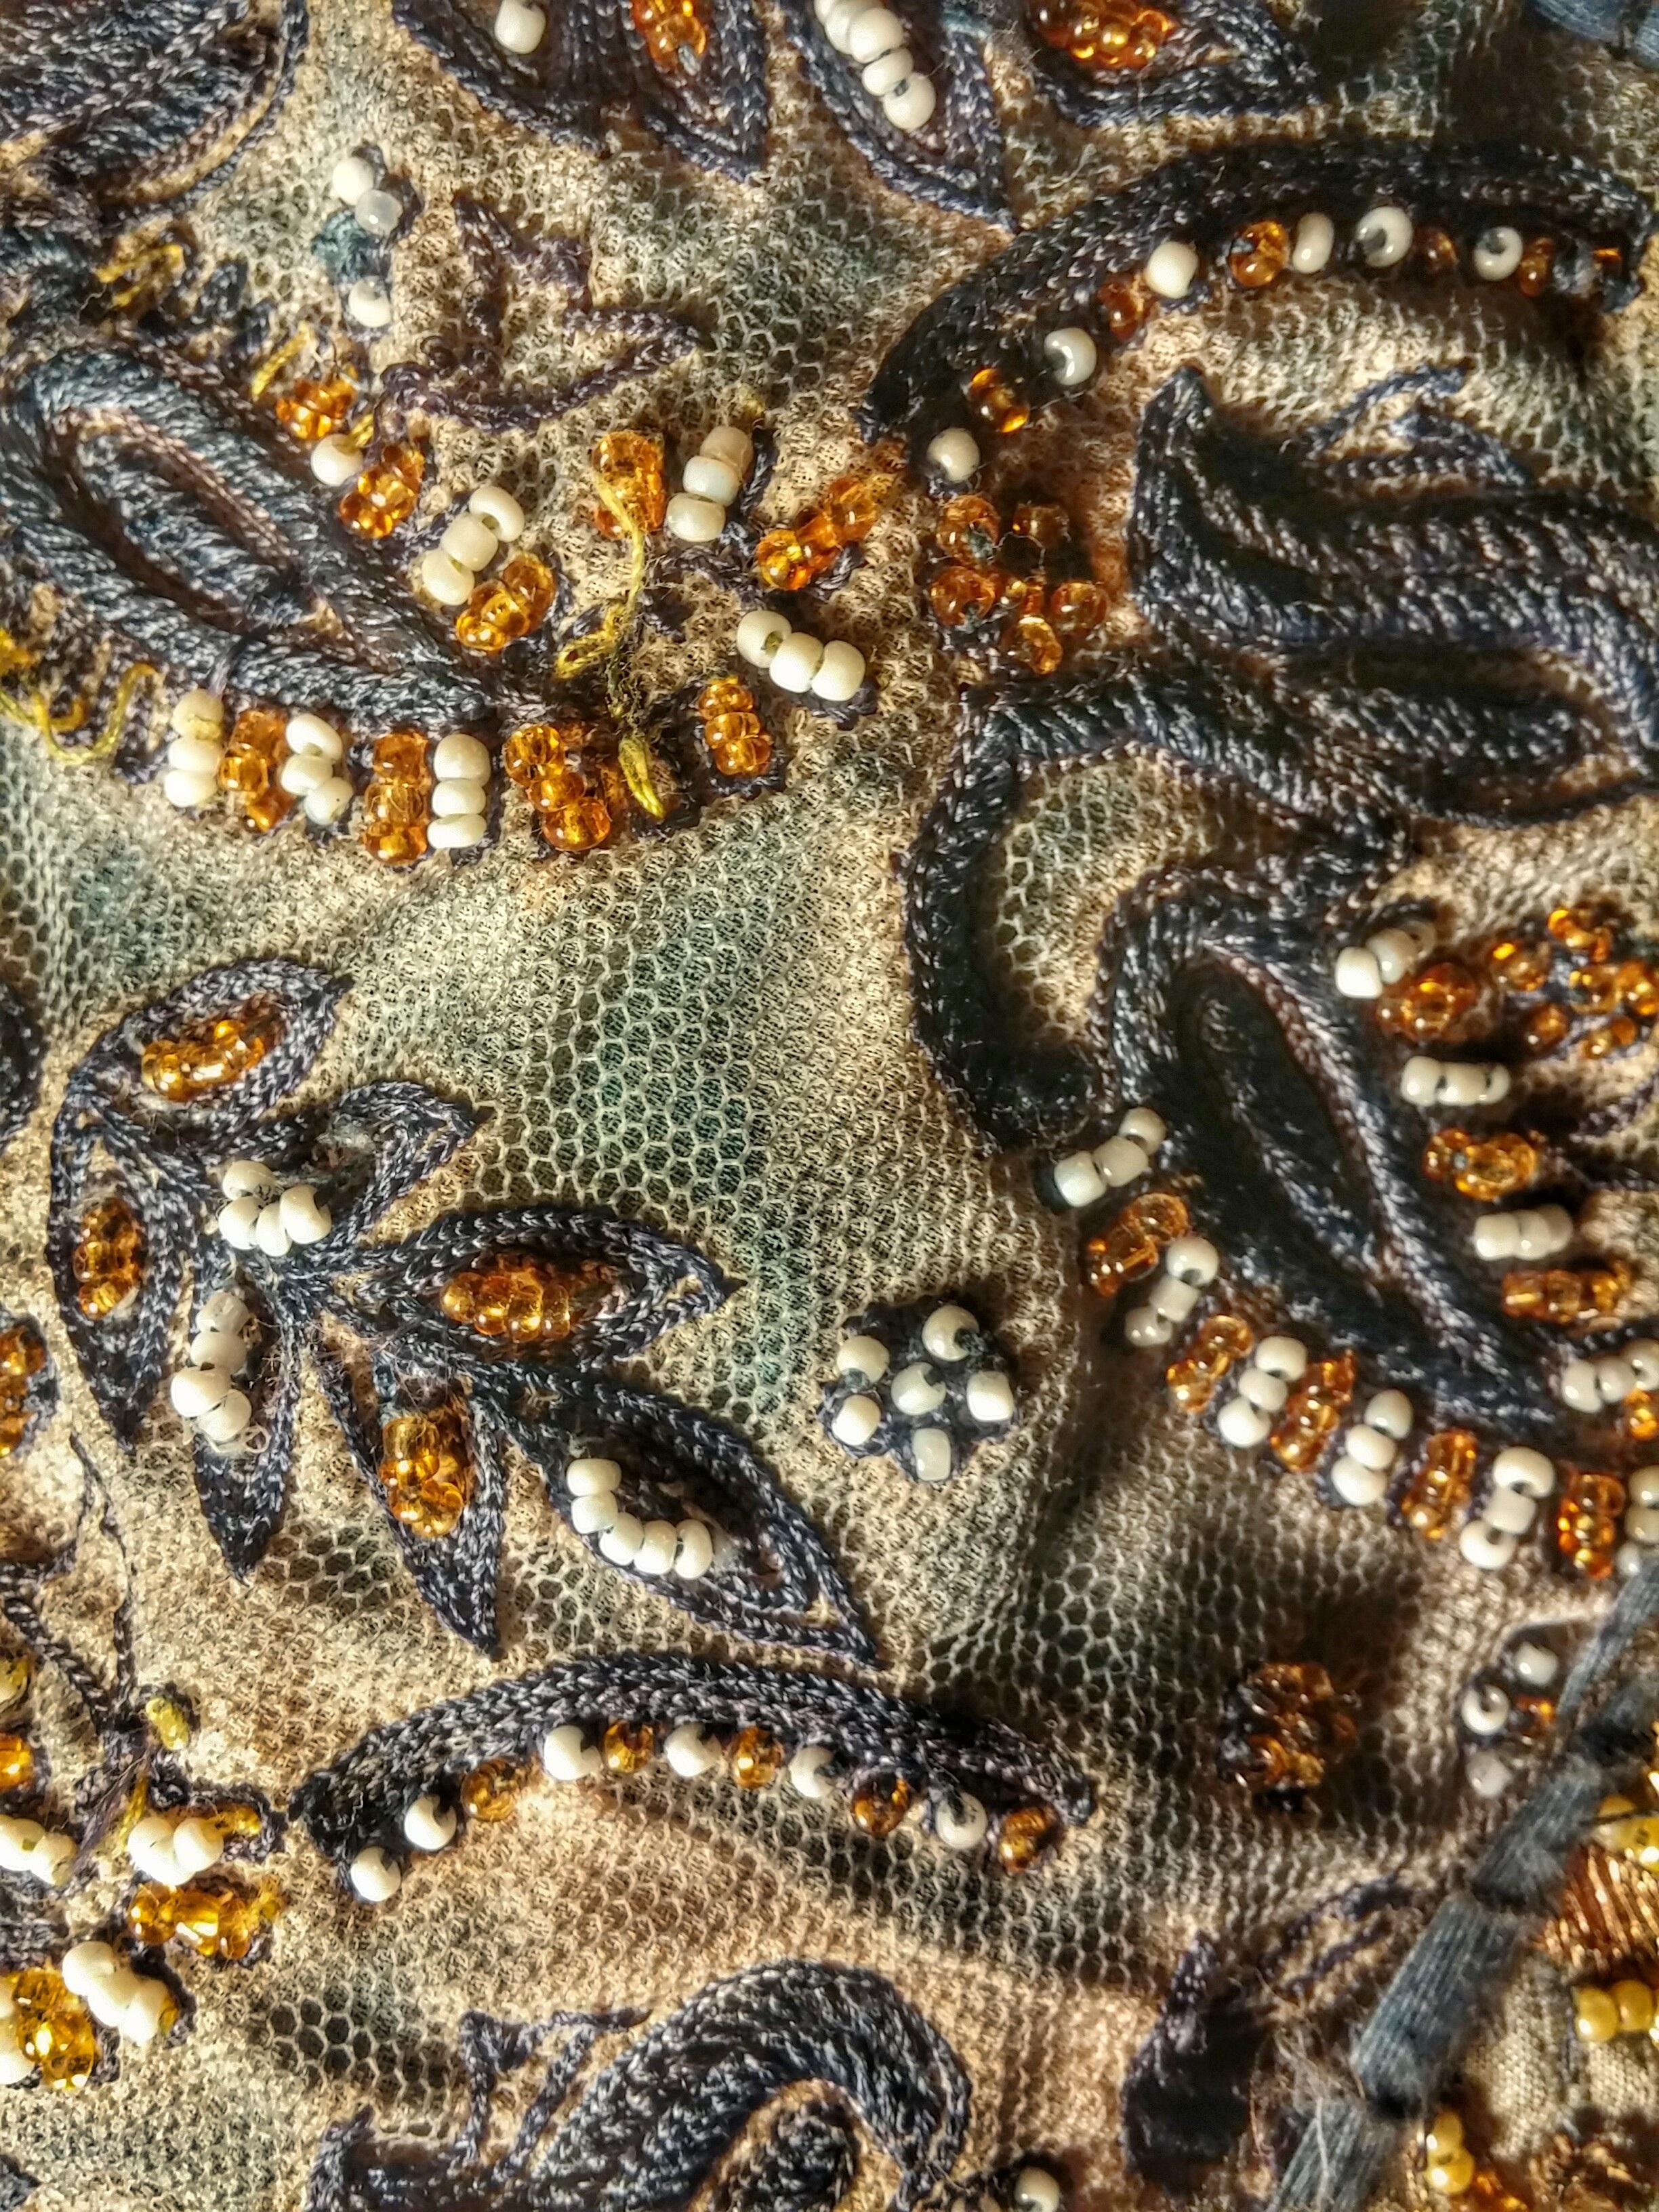 Kostenlose foto : Textur, Tierwelt, Muster, Kunst, Reptil, Fauna ...